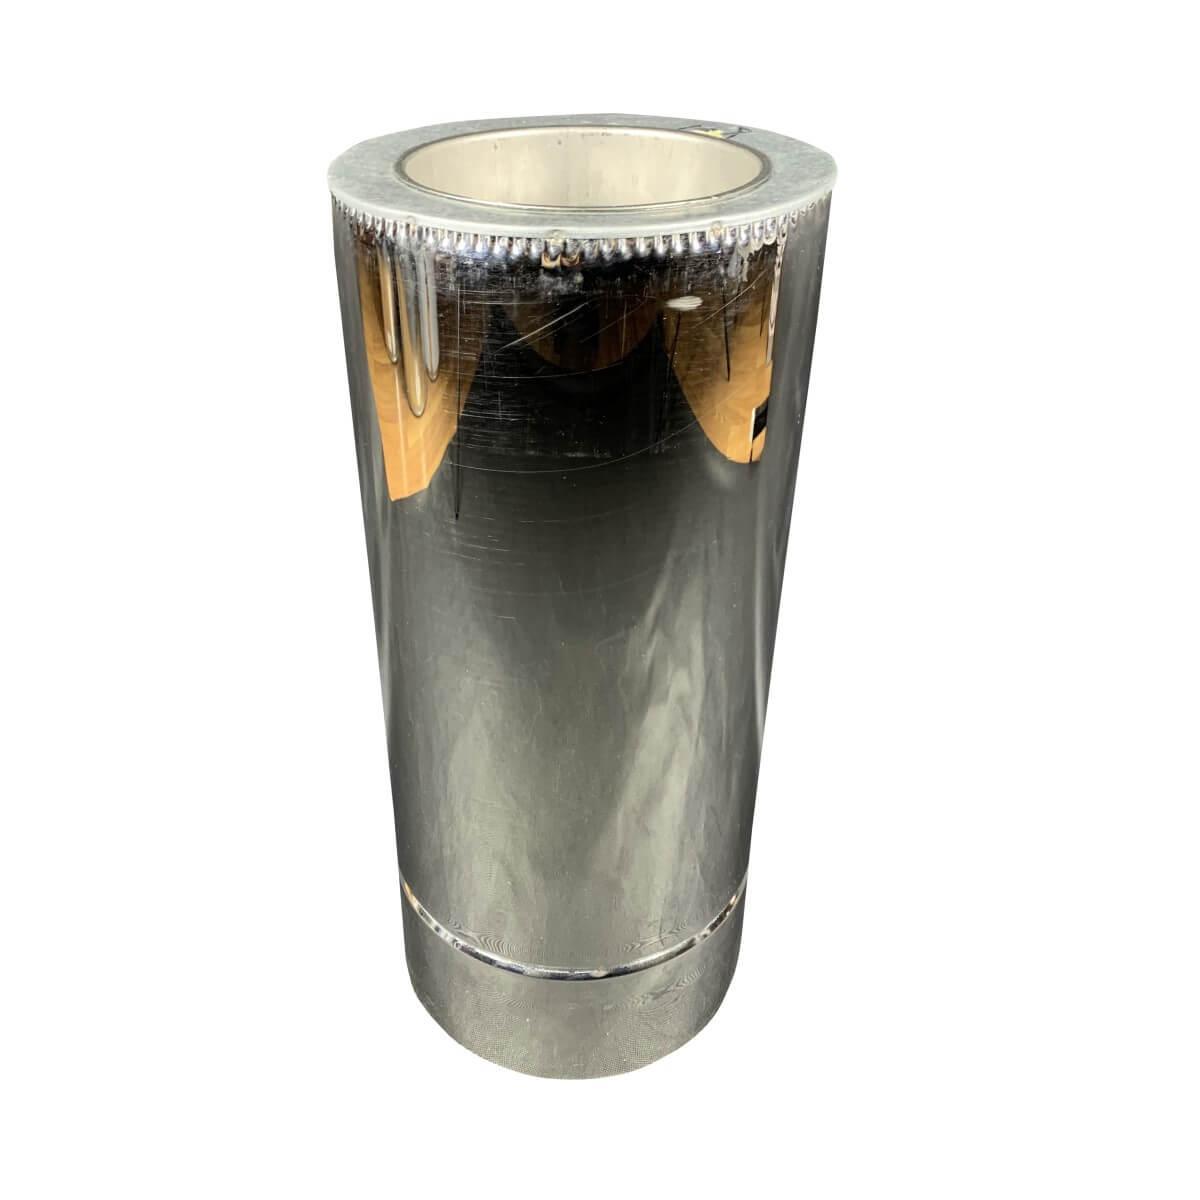 Фабрика ZIG димохідна Труба 0,5 м ø 250/320 н/н 0,6 мм